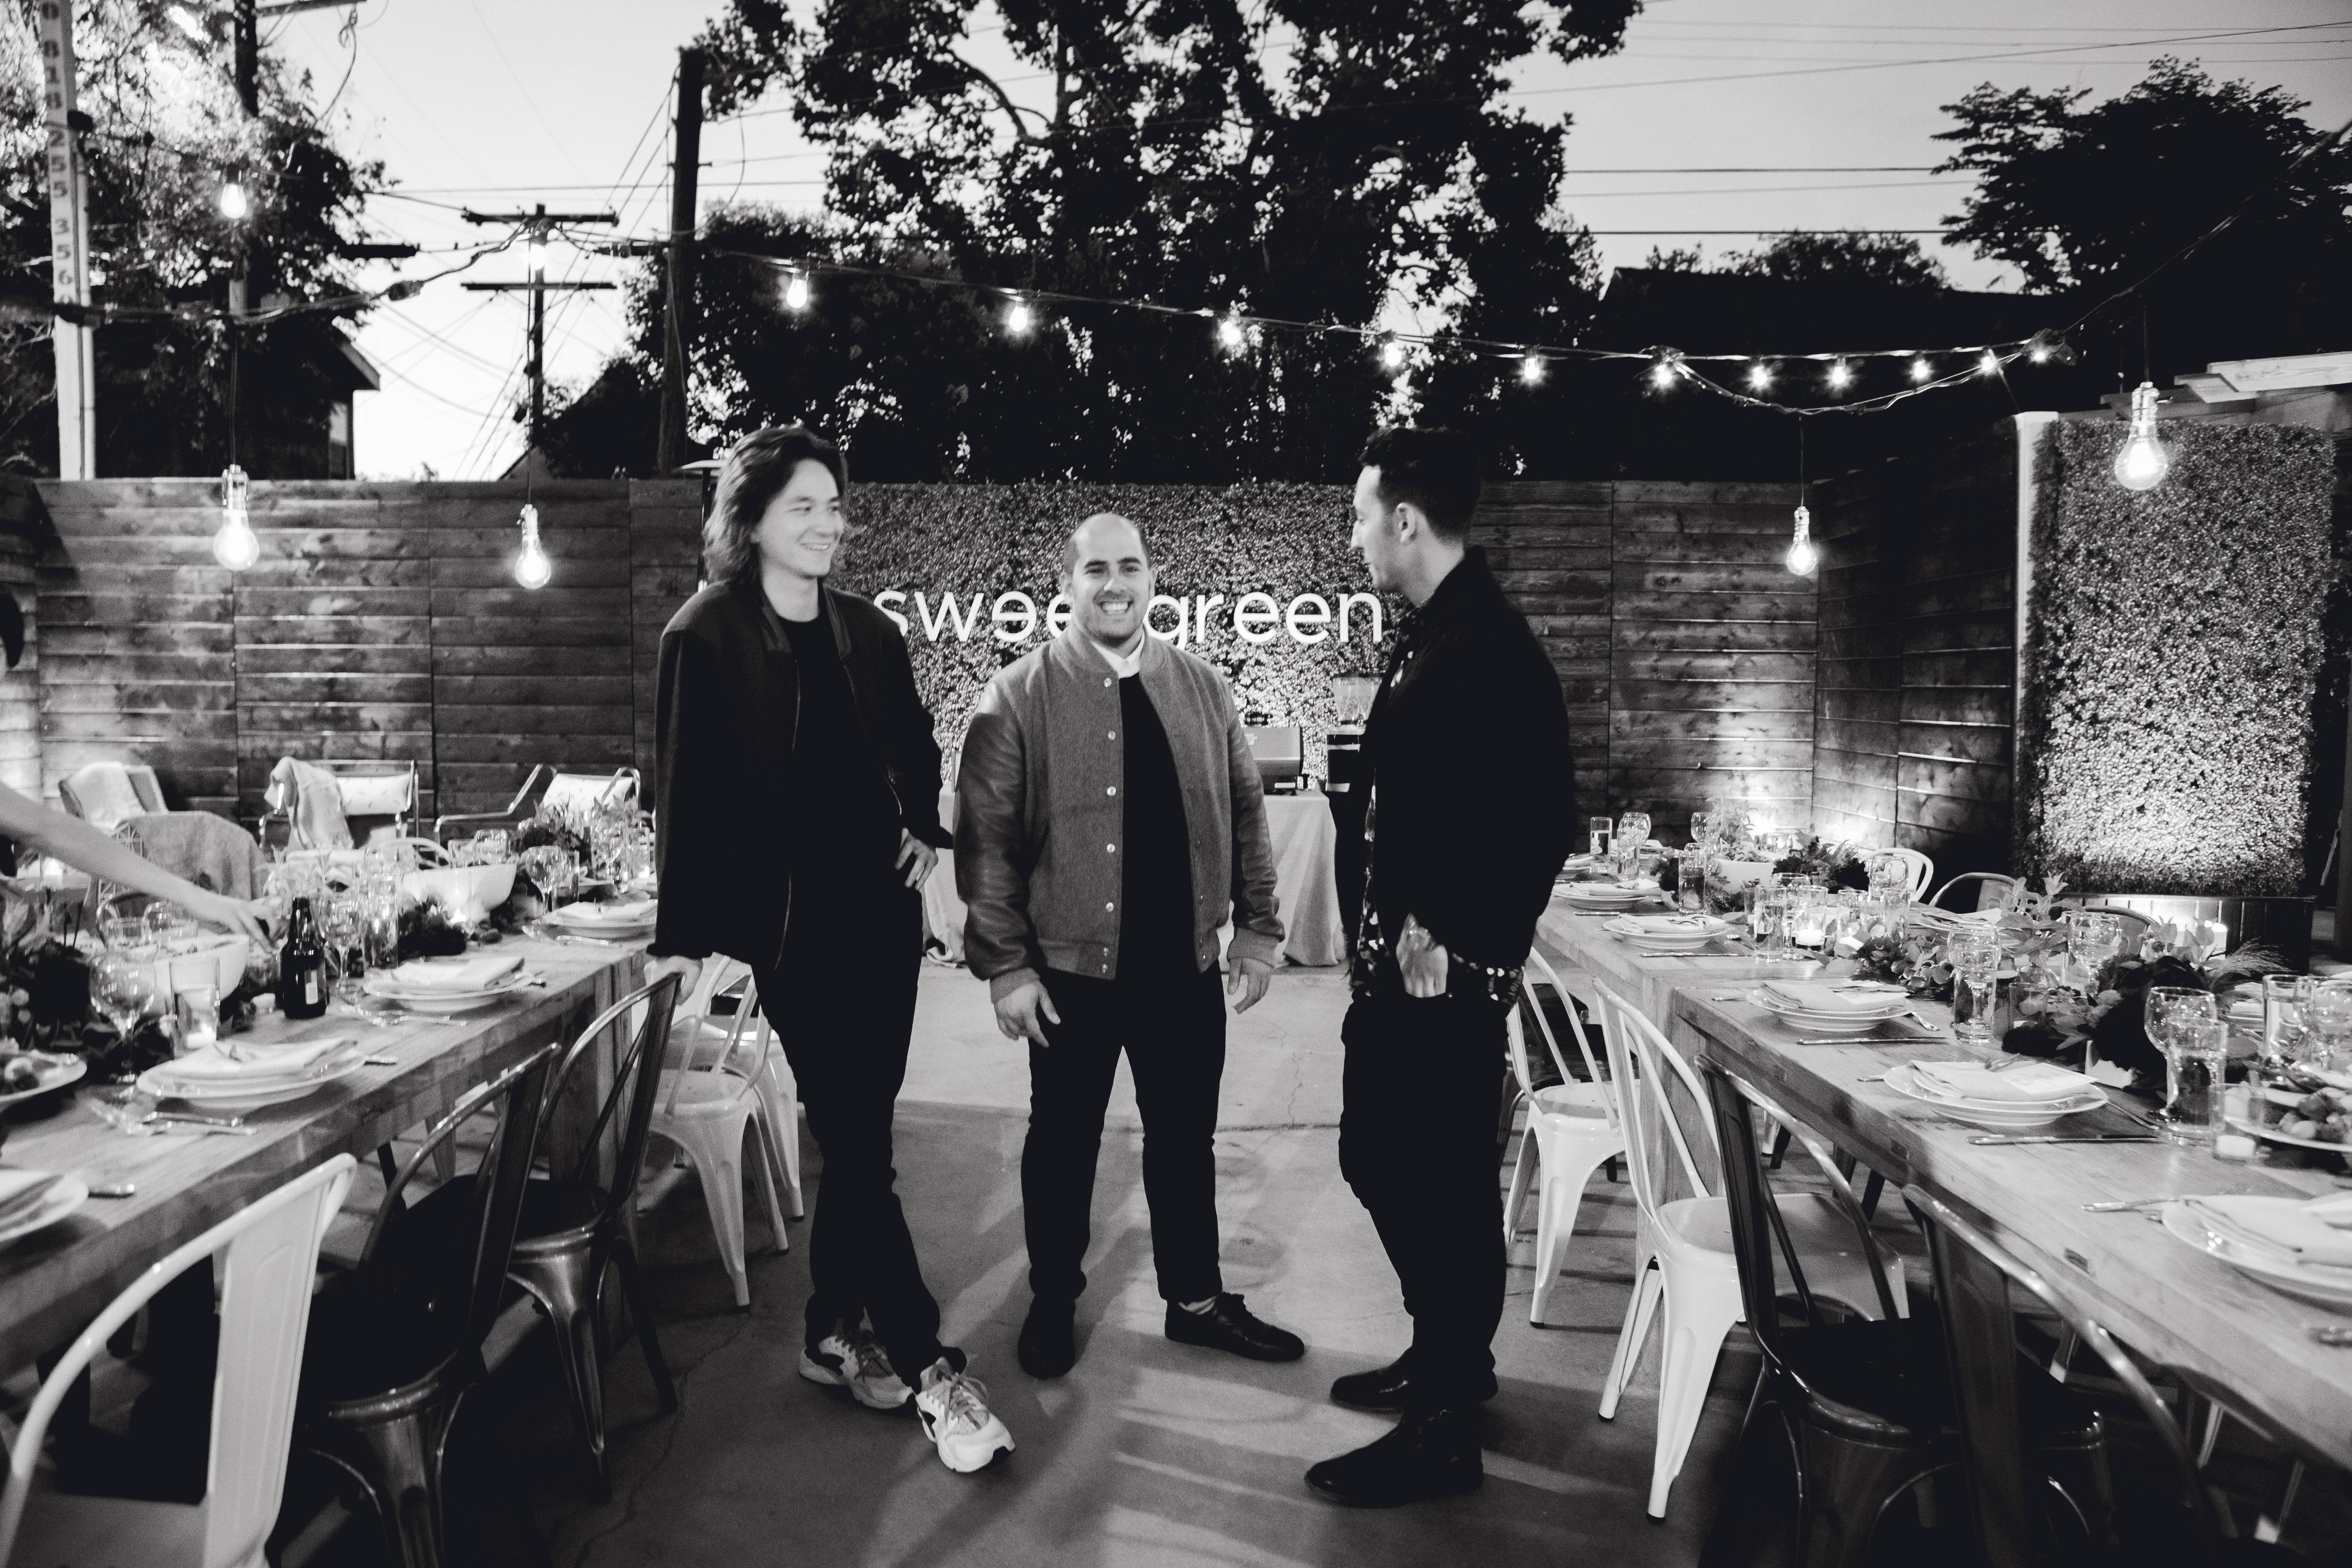 Sweetgreen founders, from left: Nathaniel Ru, Nicolas Jammet, and Jonathan Neman